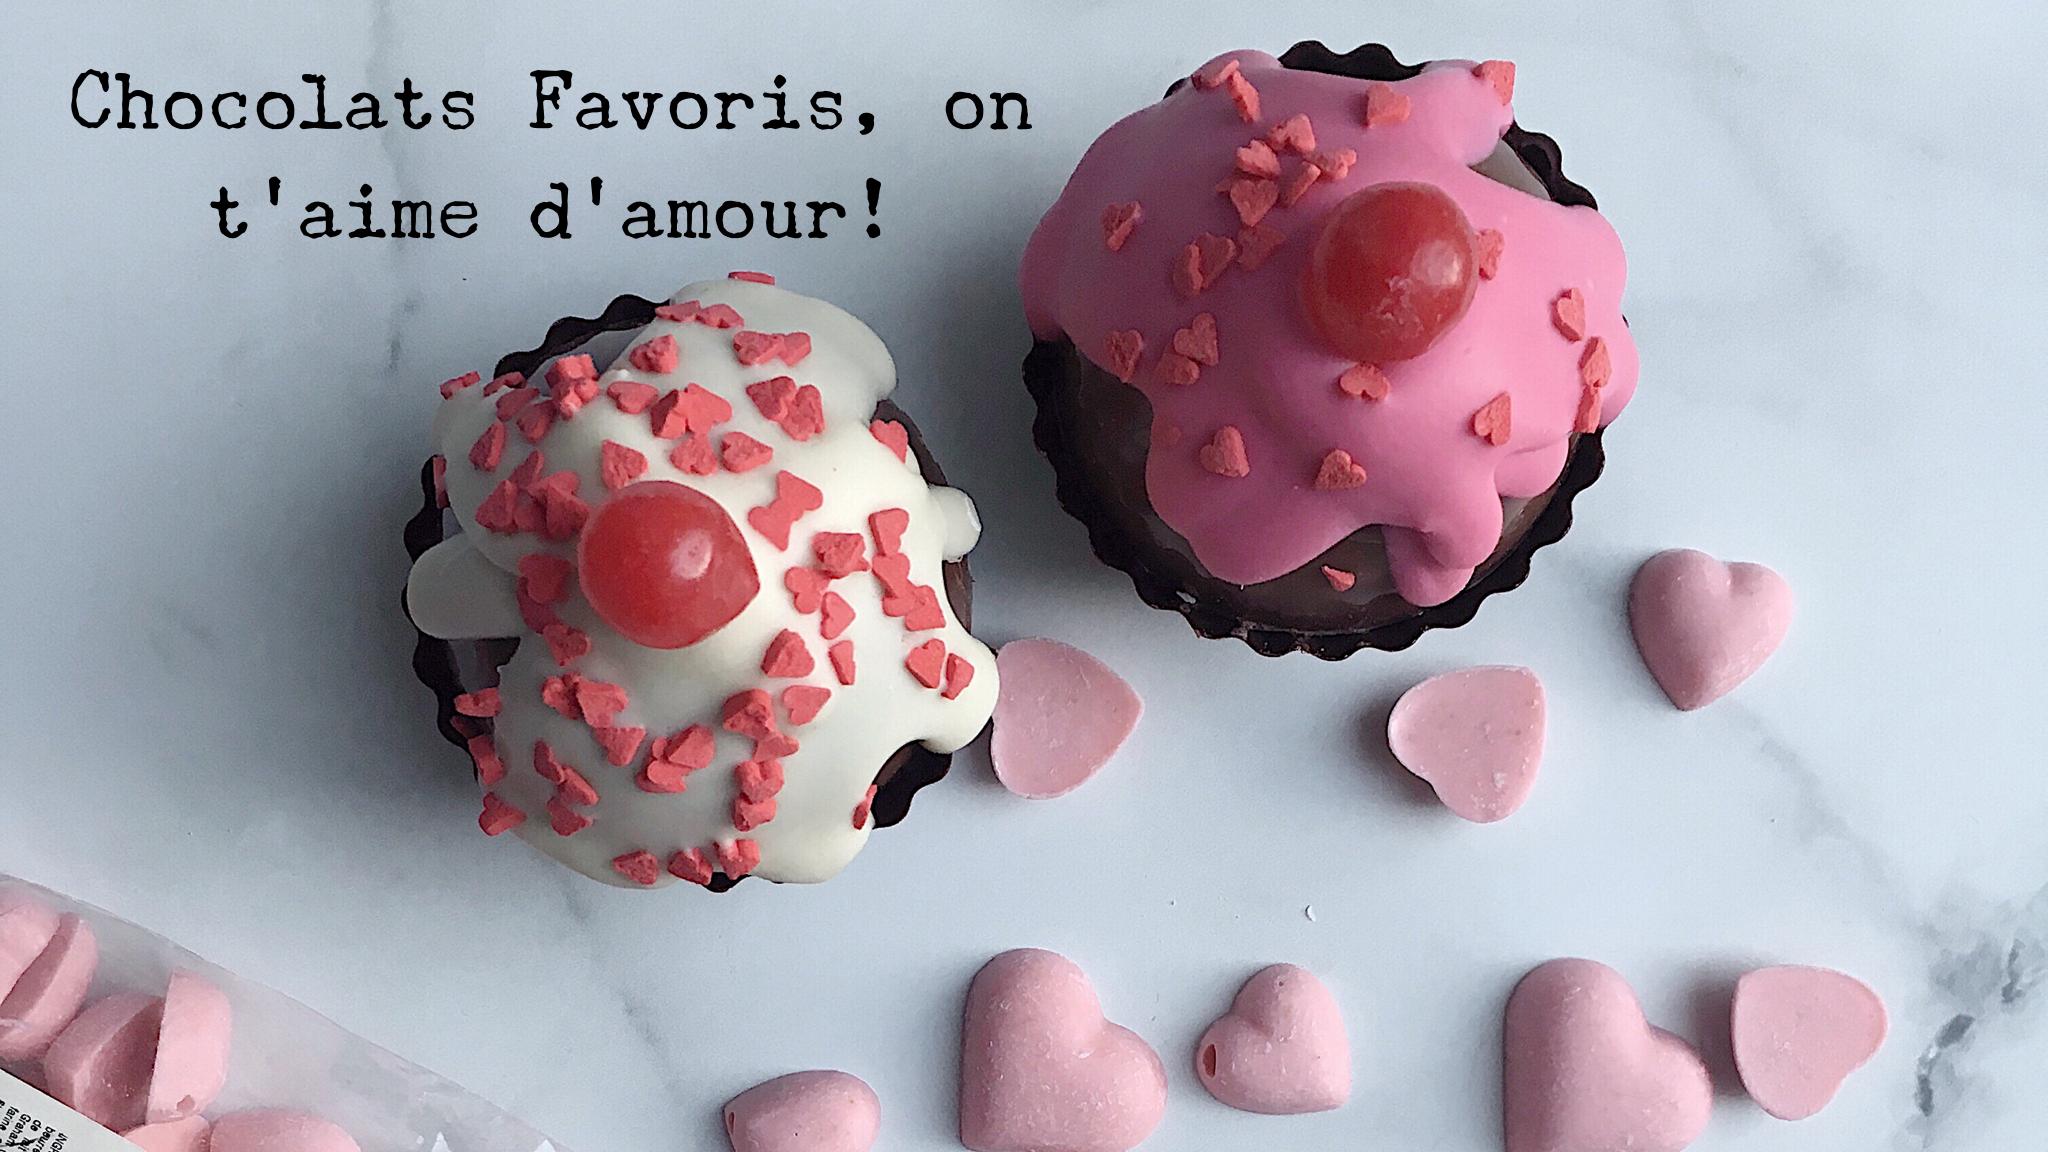 Chocolats Favoris on t'aime d'amour